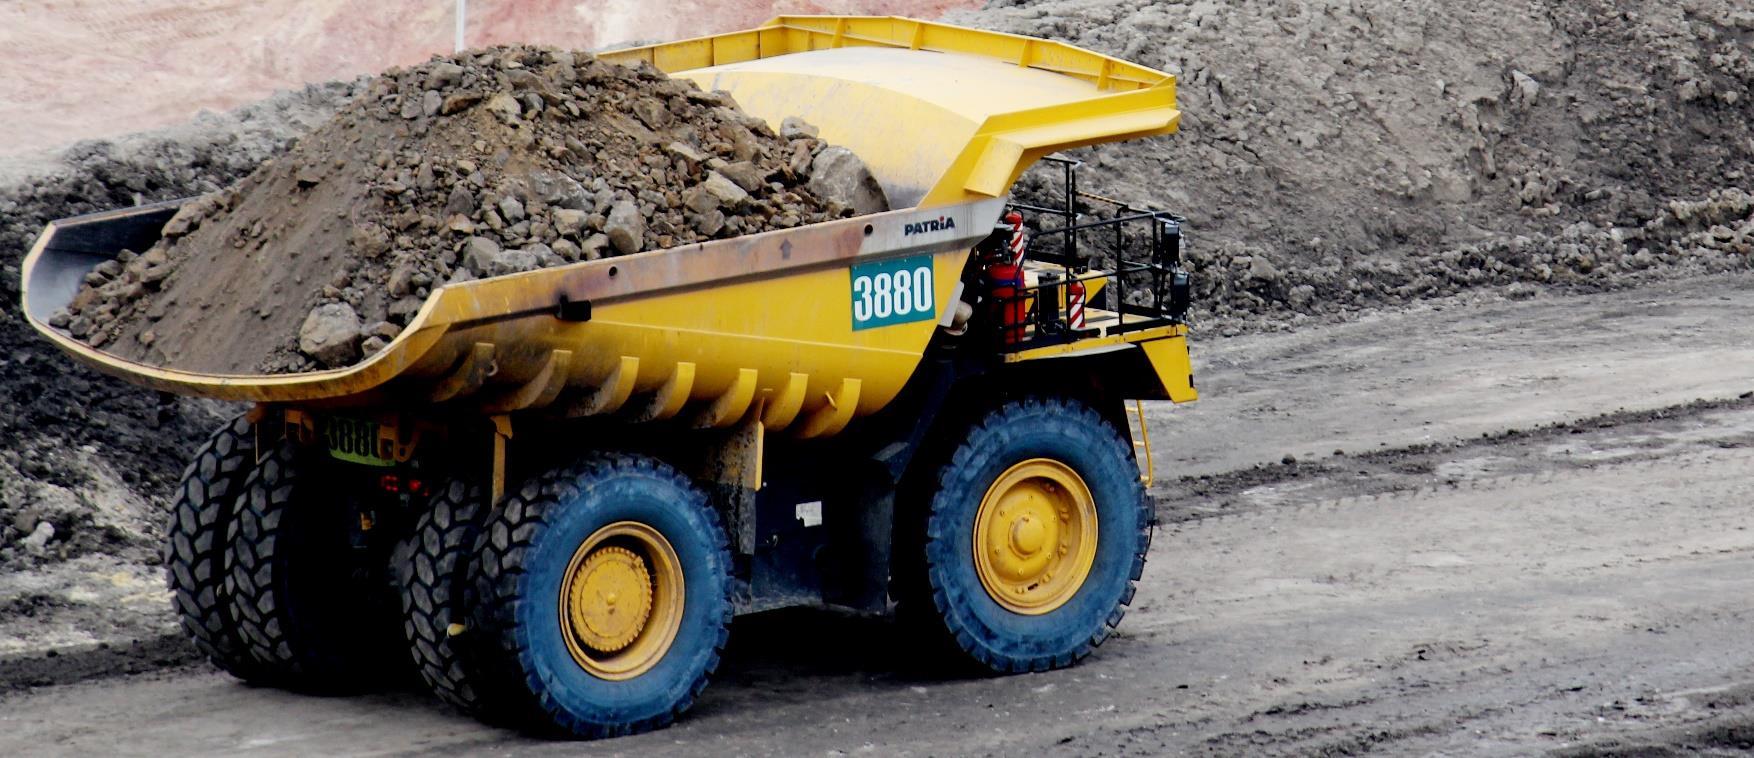 truk tambang, mobil pengangkut alat berat, harga truk tambang